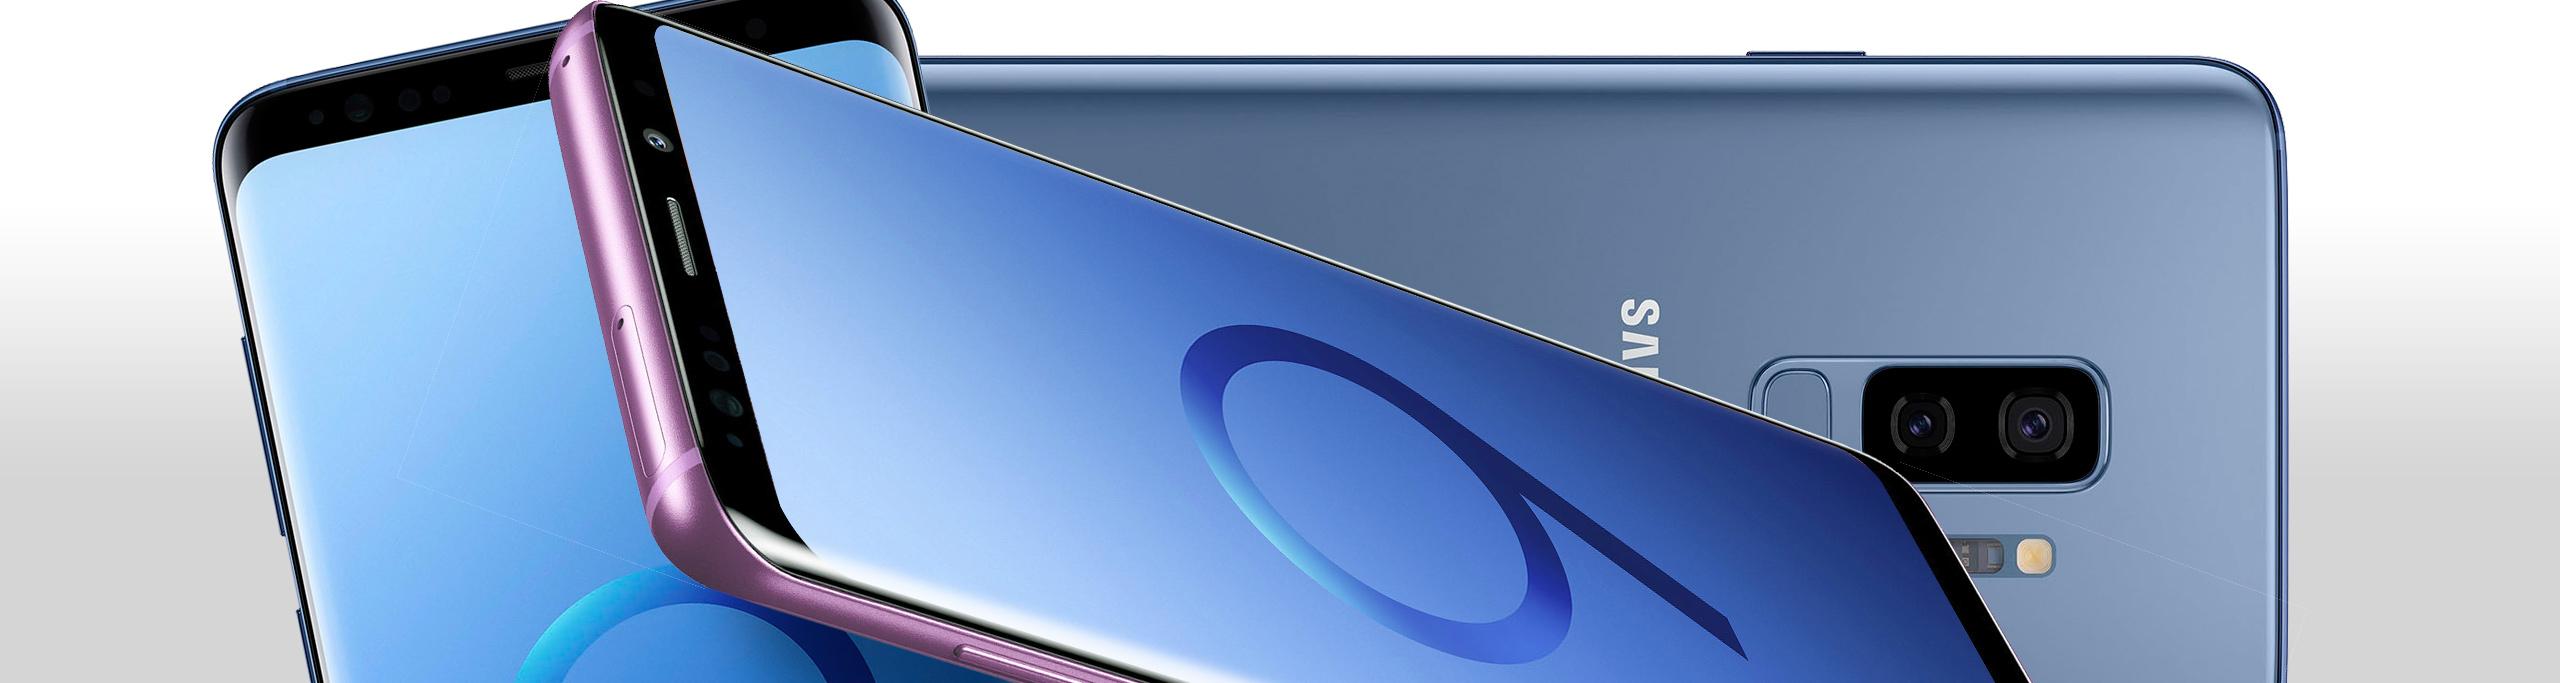 S9+ (G965F)